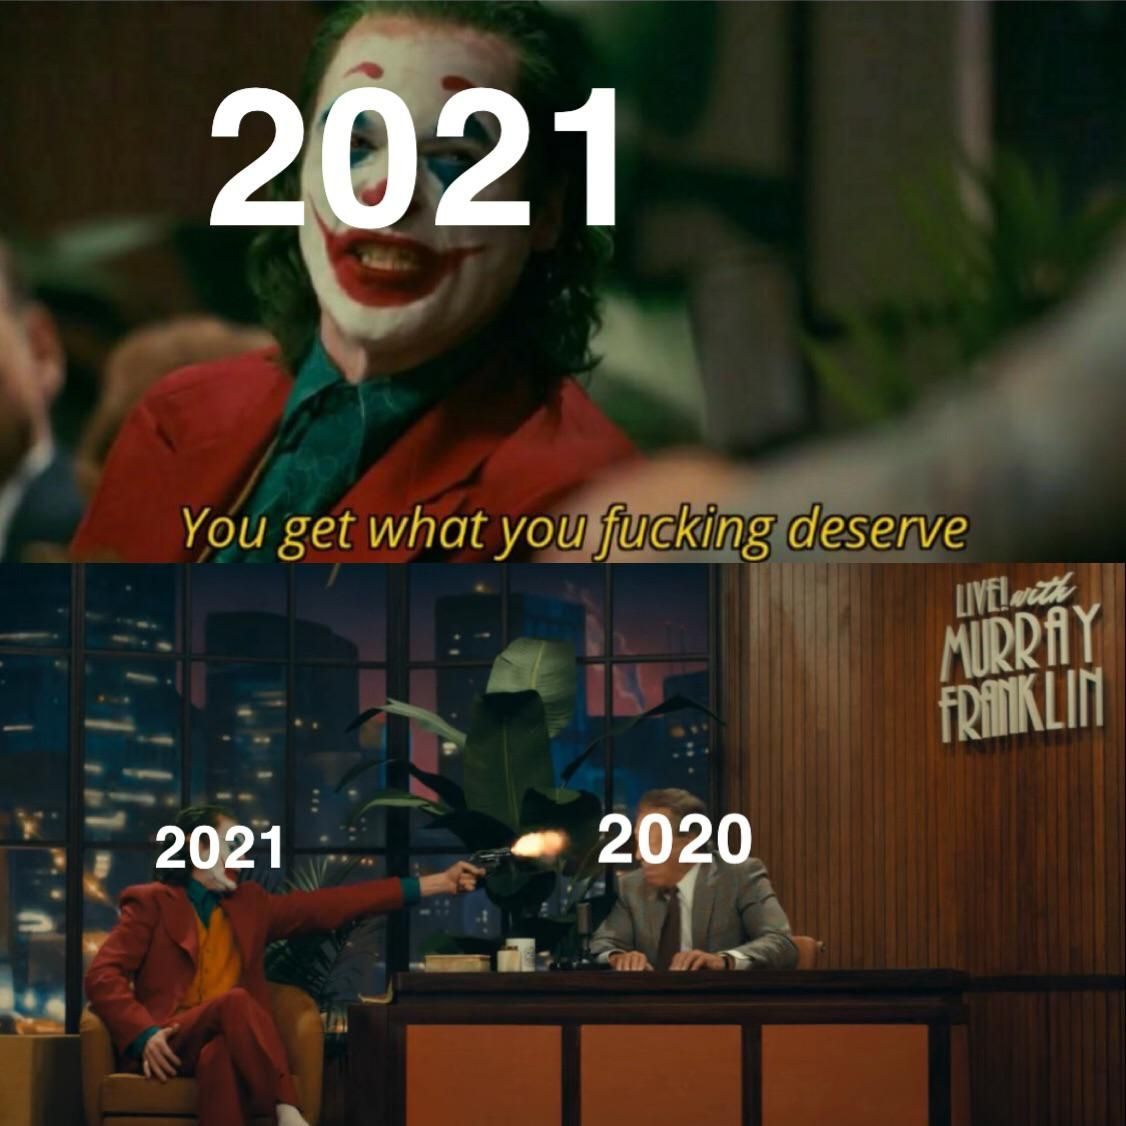 God Forbid 2021 Ends Up Being Worse Than 2020 Memes Engracados Emissoras De Tv Memes